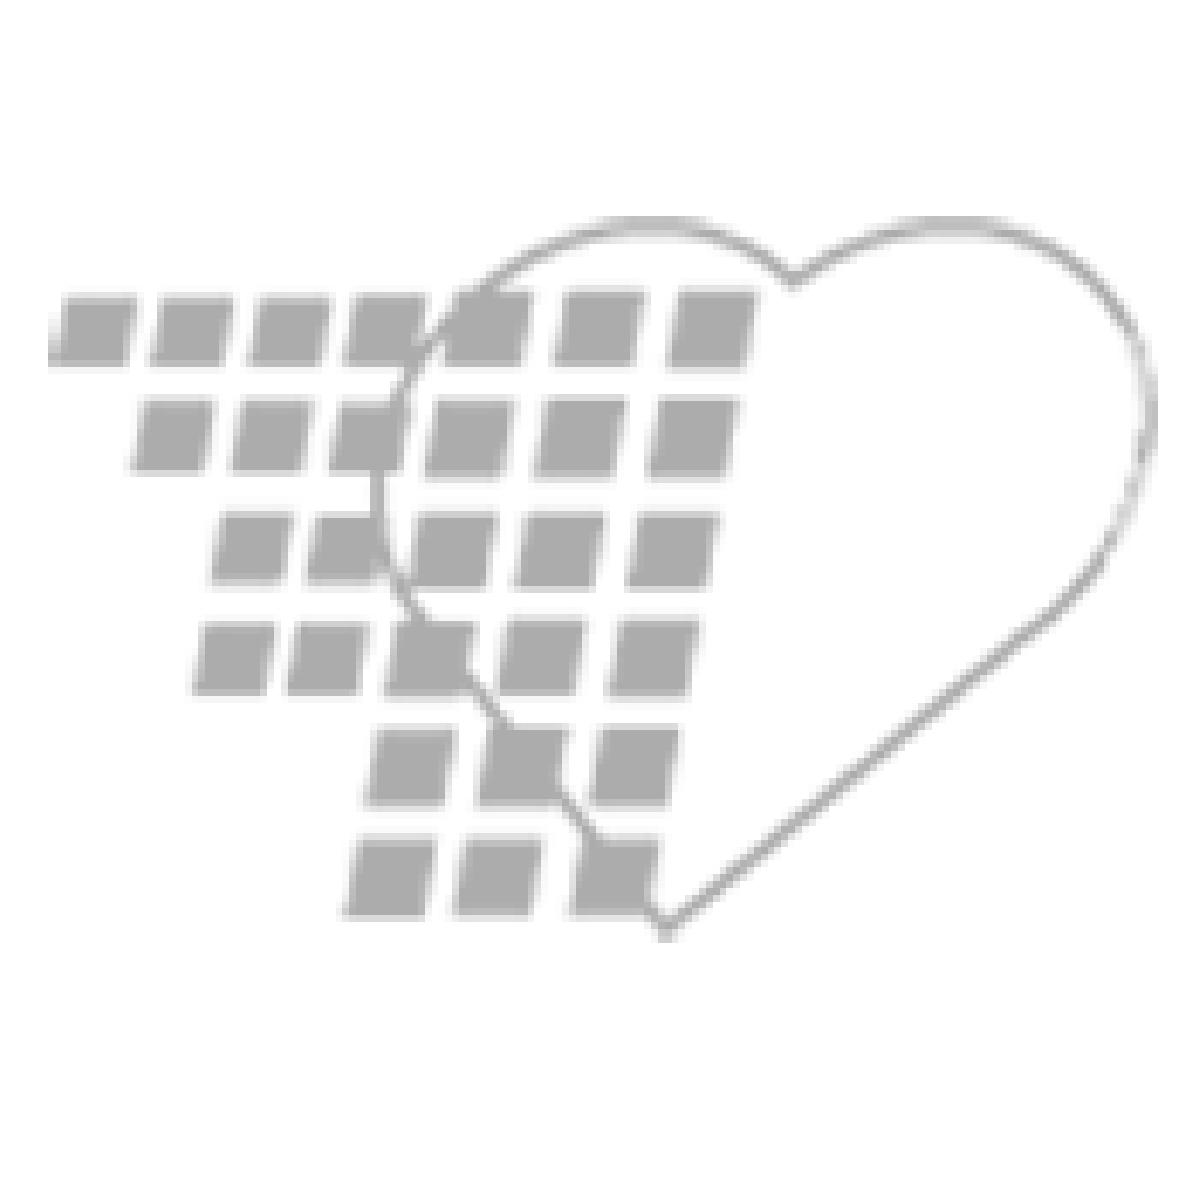 05-51-1628P 3M™ Tegaderm™ Transparent Dressing